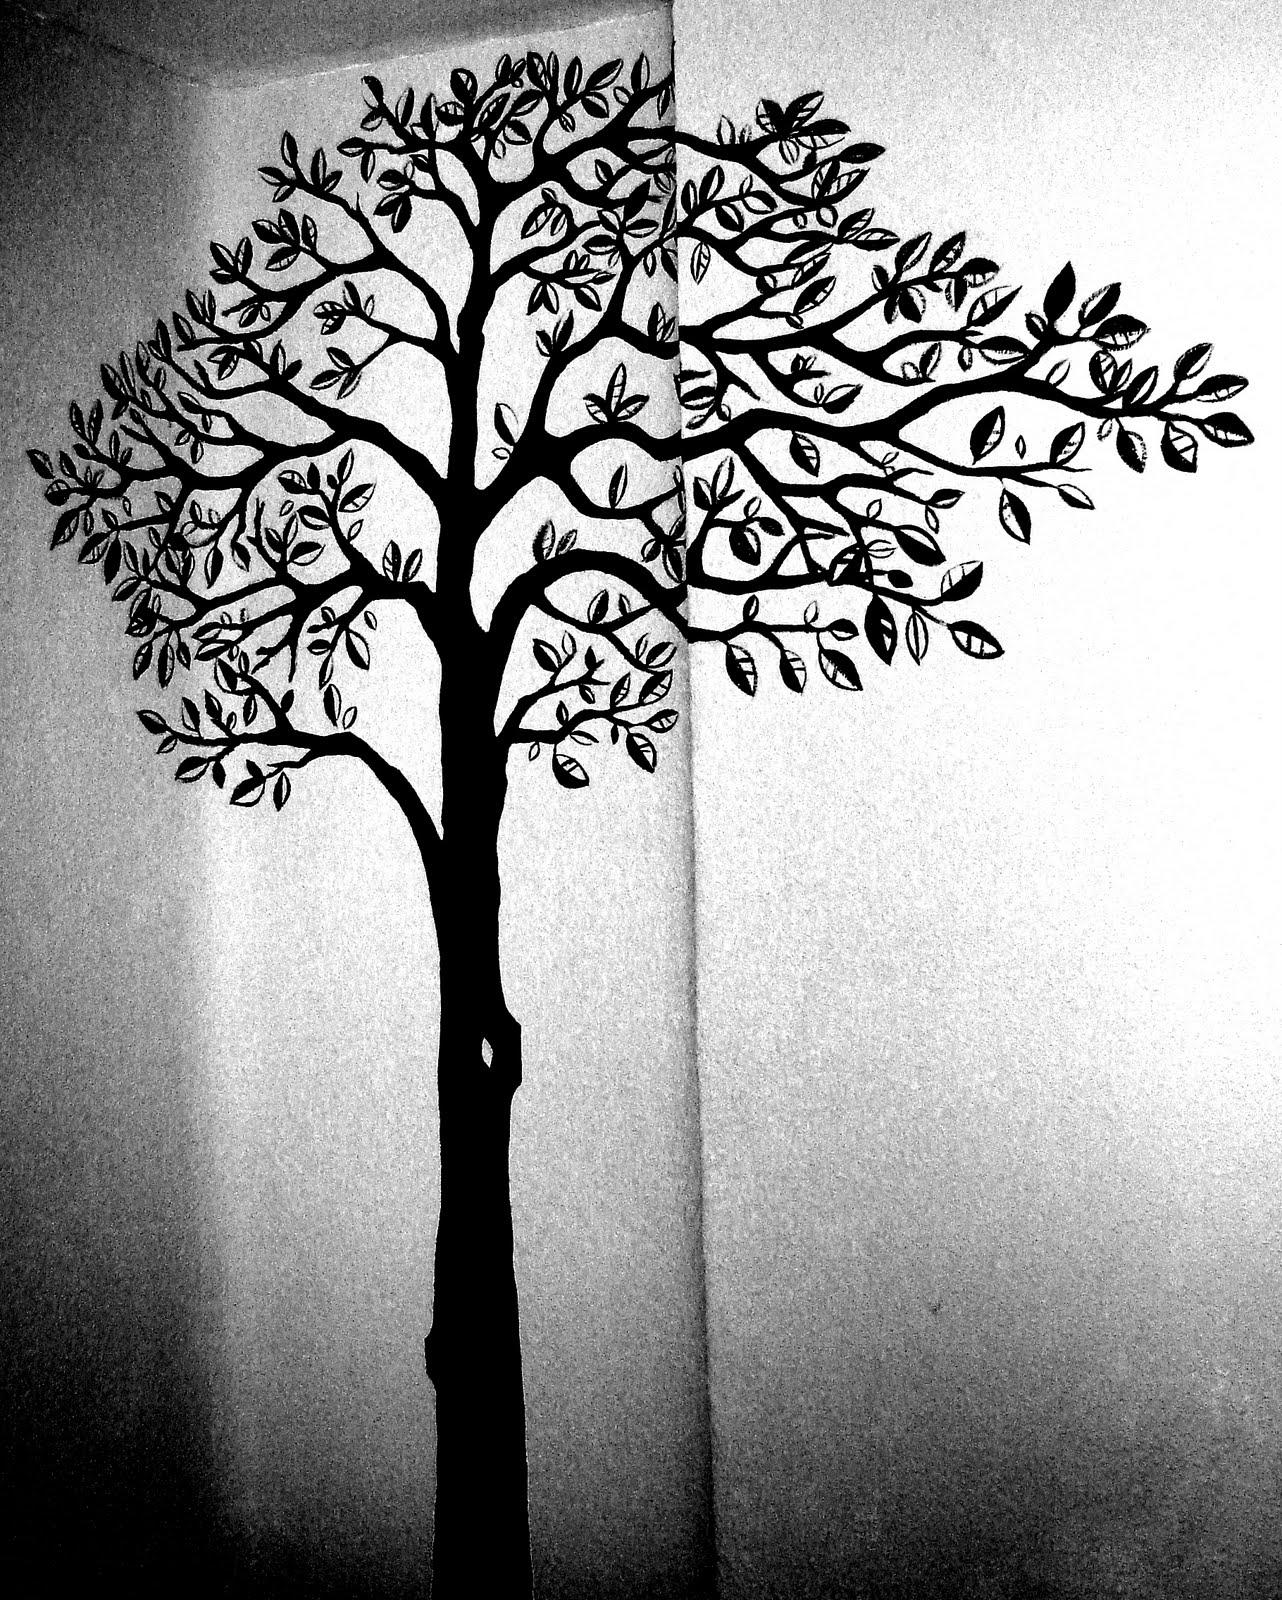 Decoraci n de interiores paredes con empapelado de flores - Fotografias para paredes ...